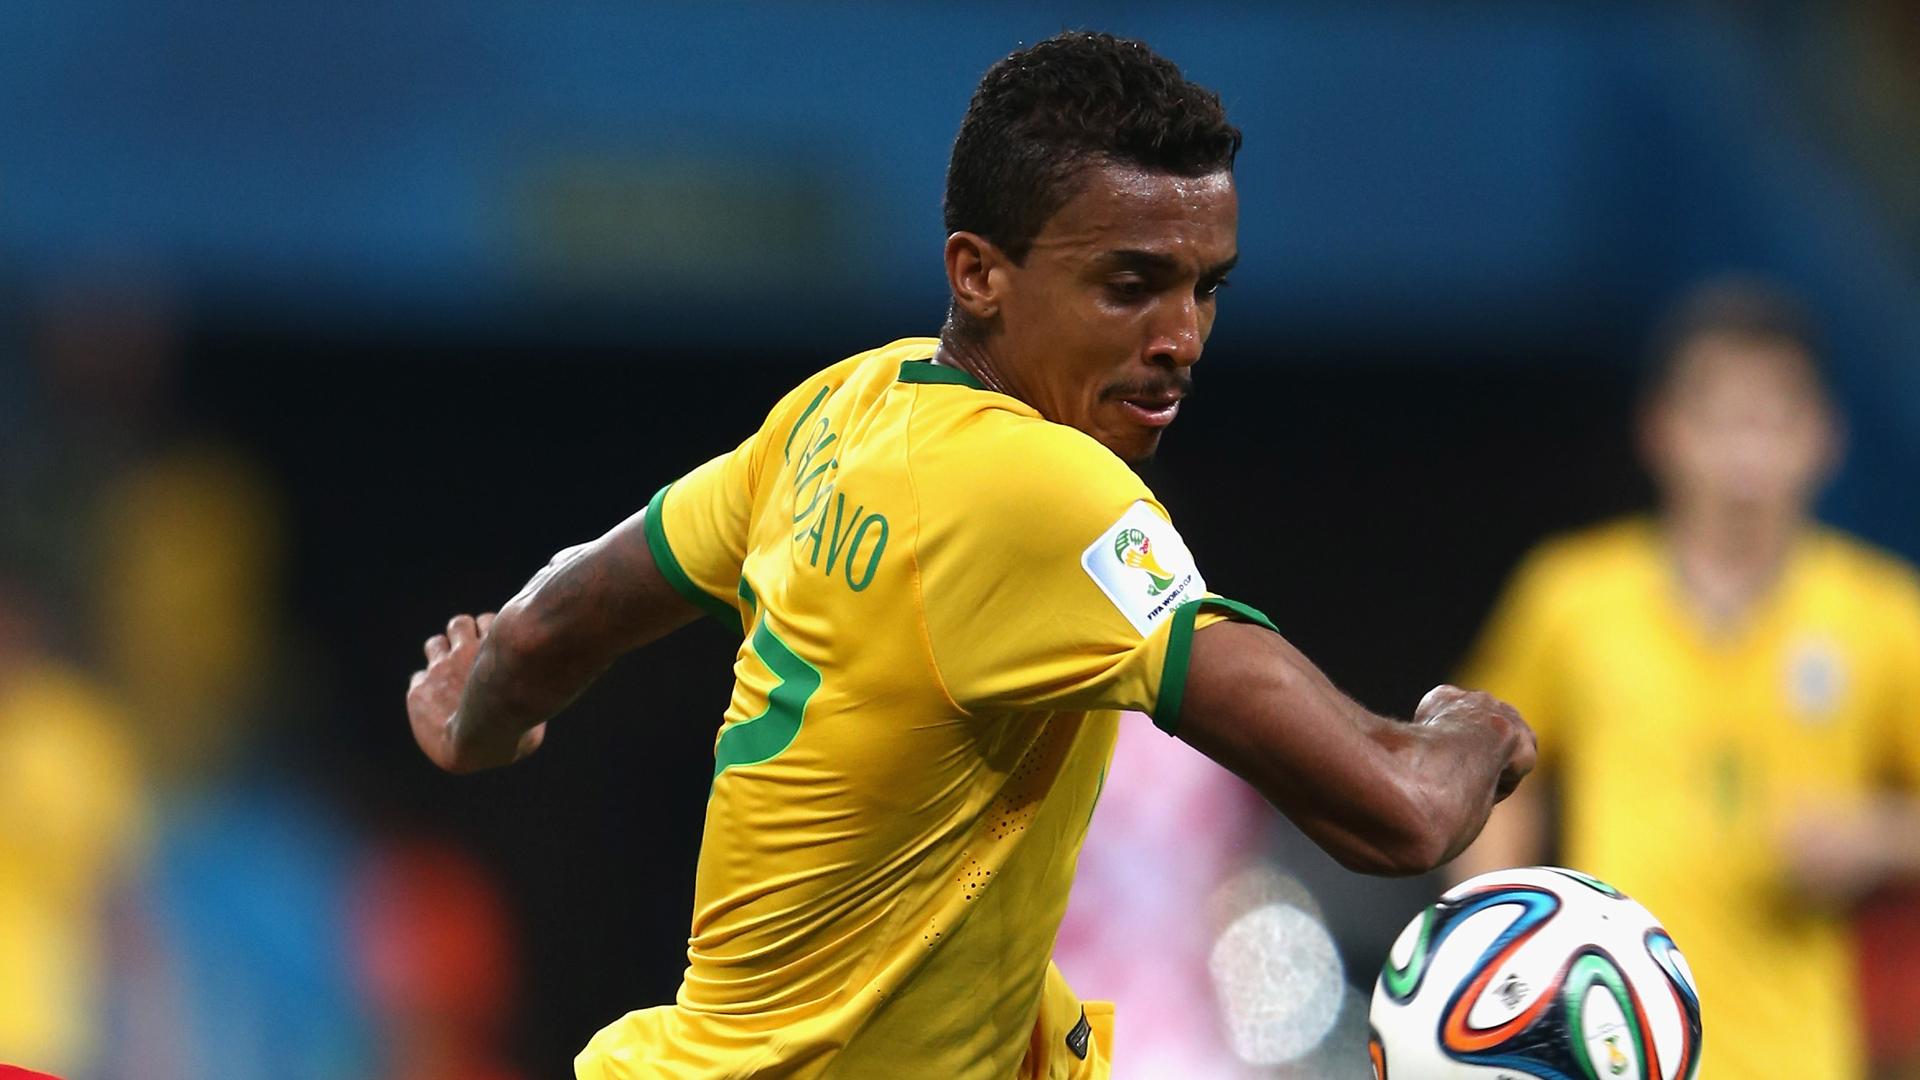 Brésil : Neymar et les Parisiens retenus, pas Luiz Gustavo